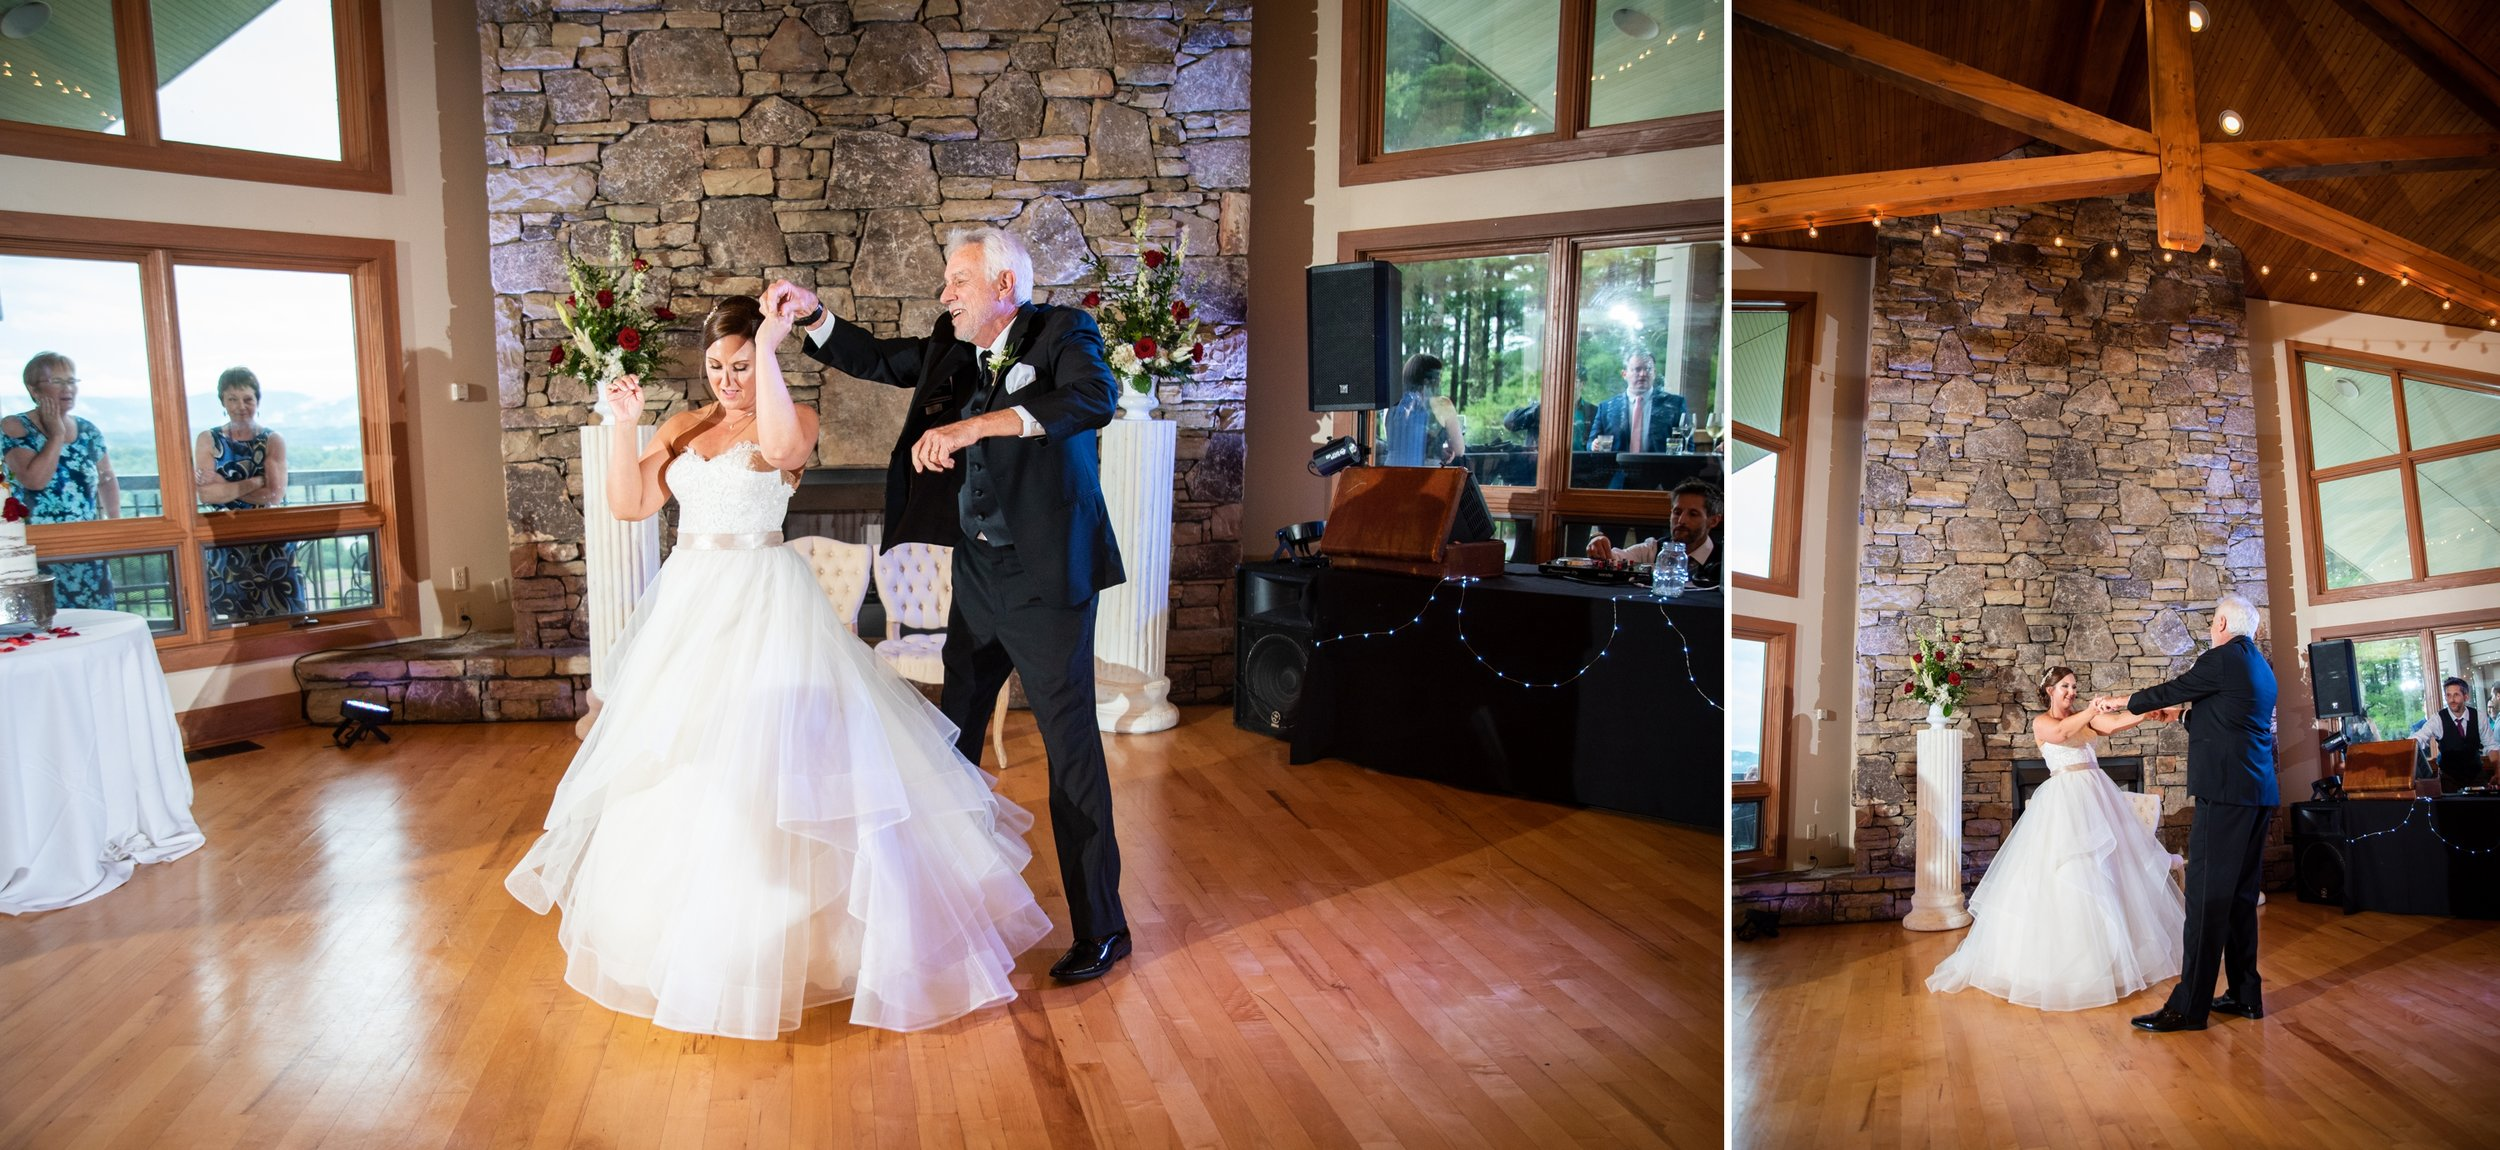 High Vista Weddings - Asheville Vendors 3 3.jpg